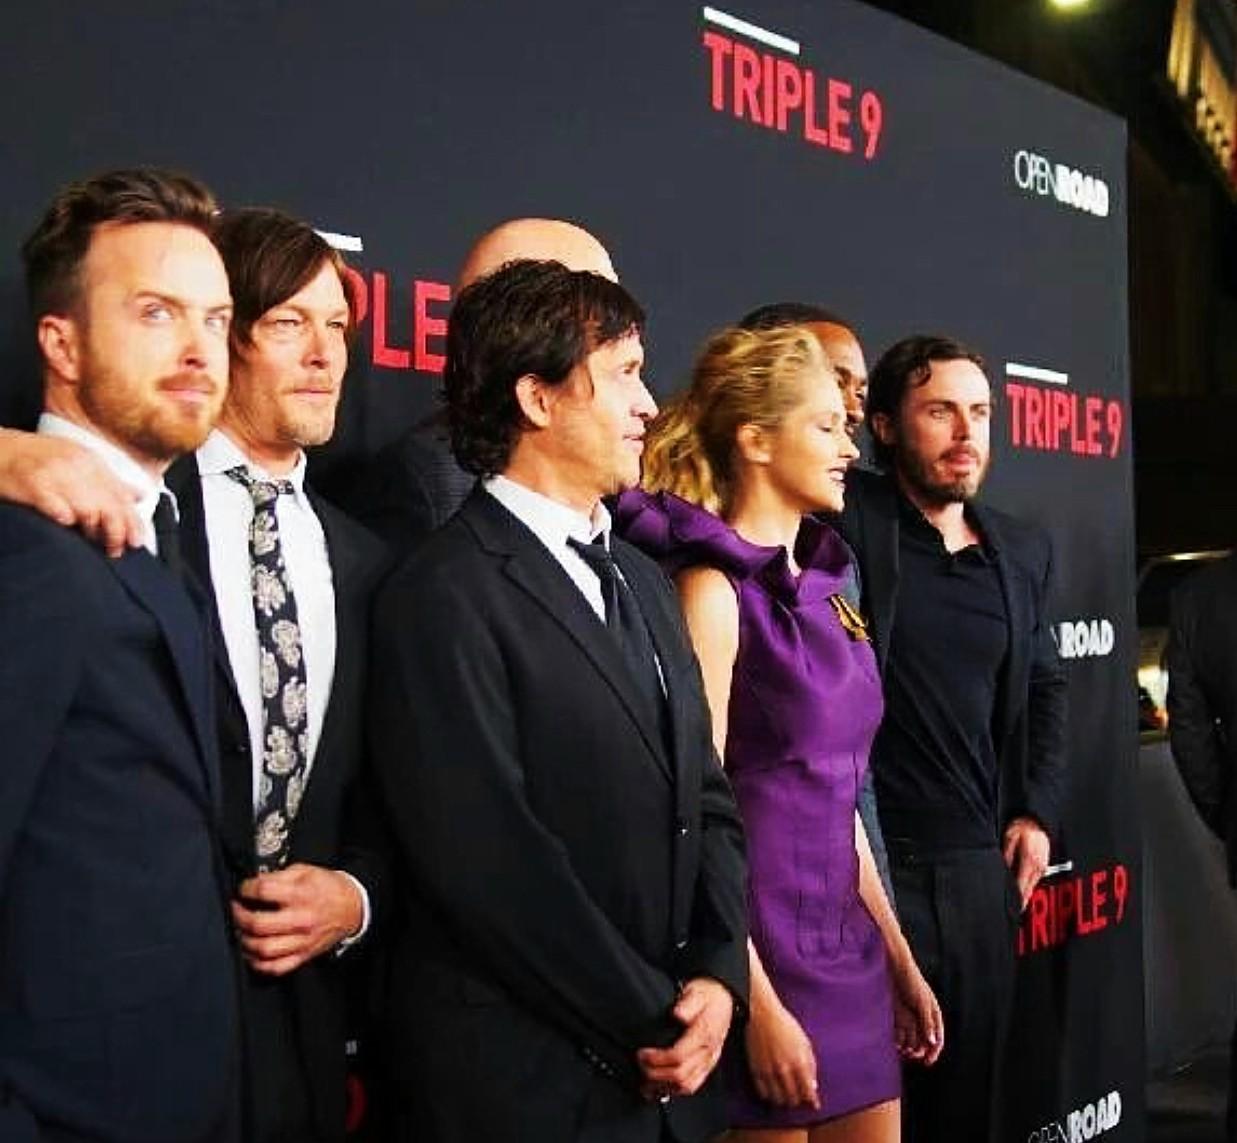 Triple 9, movie premiere, Aaron Paul, Casey Affleck, Norman Reedus